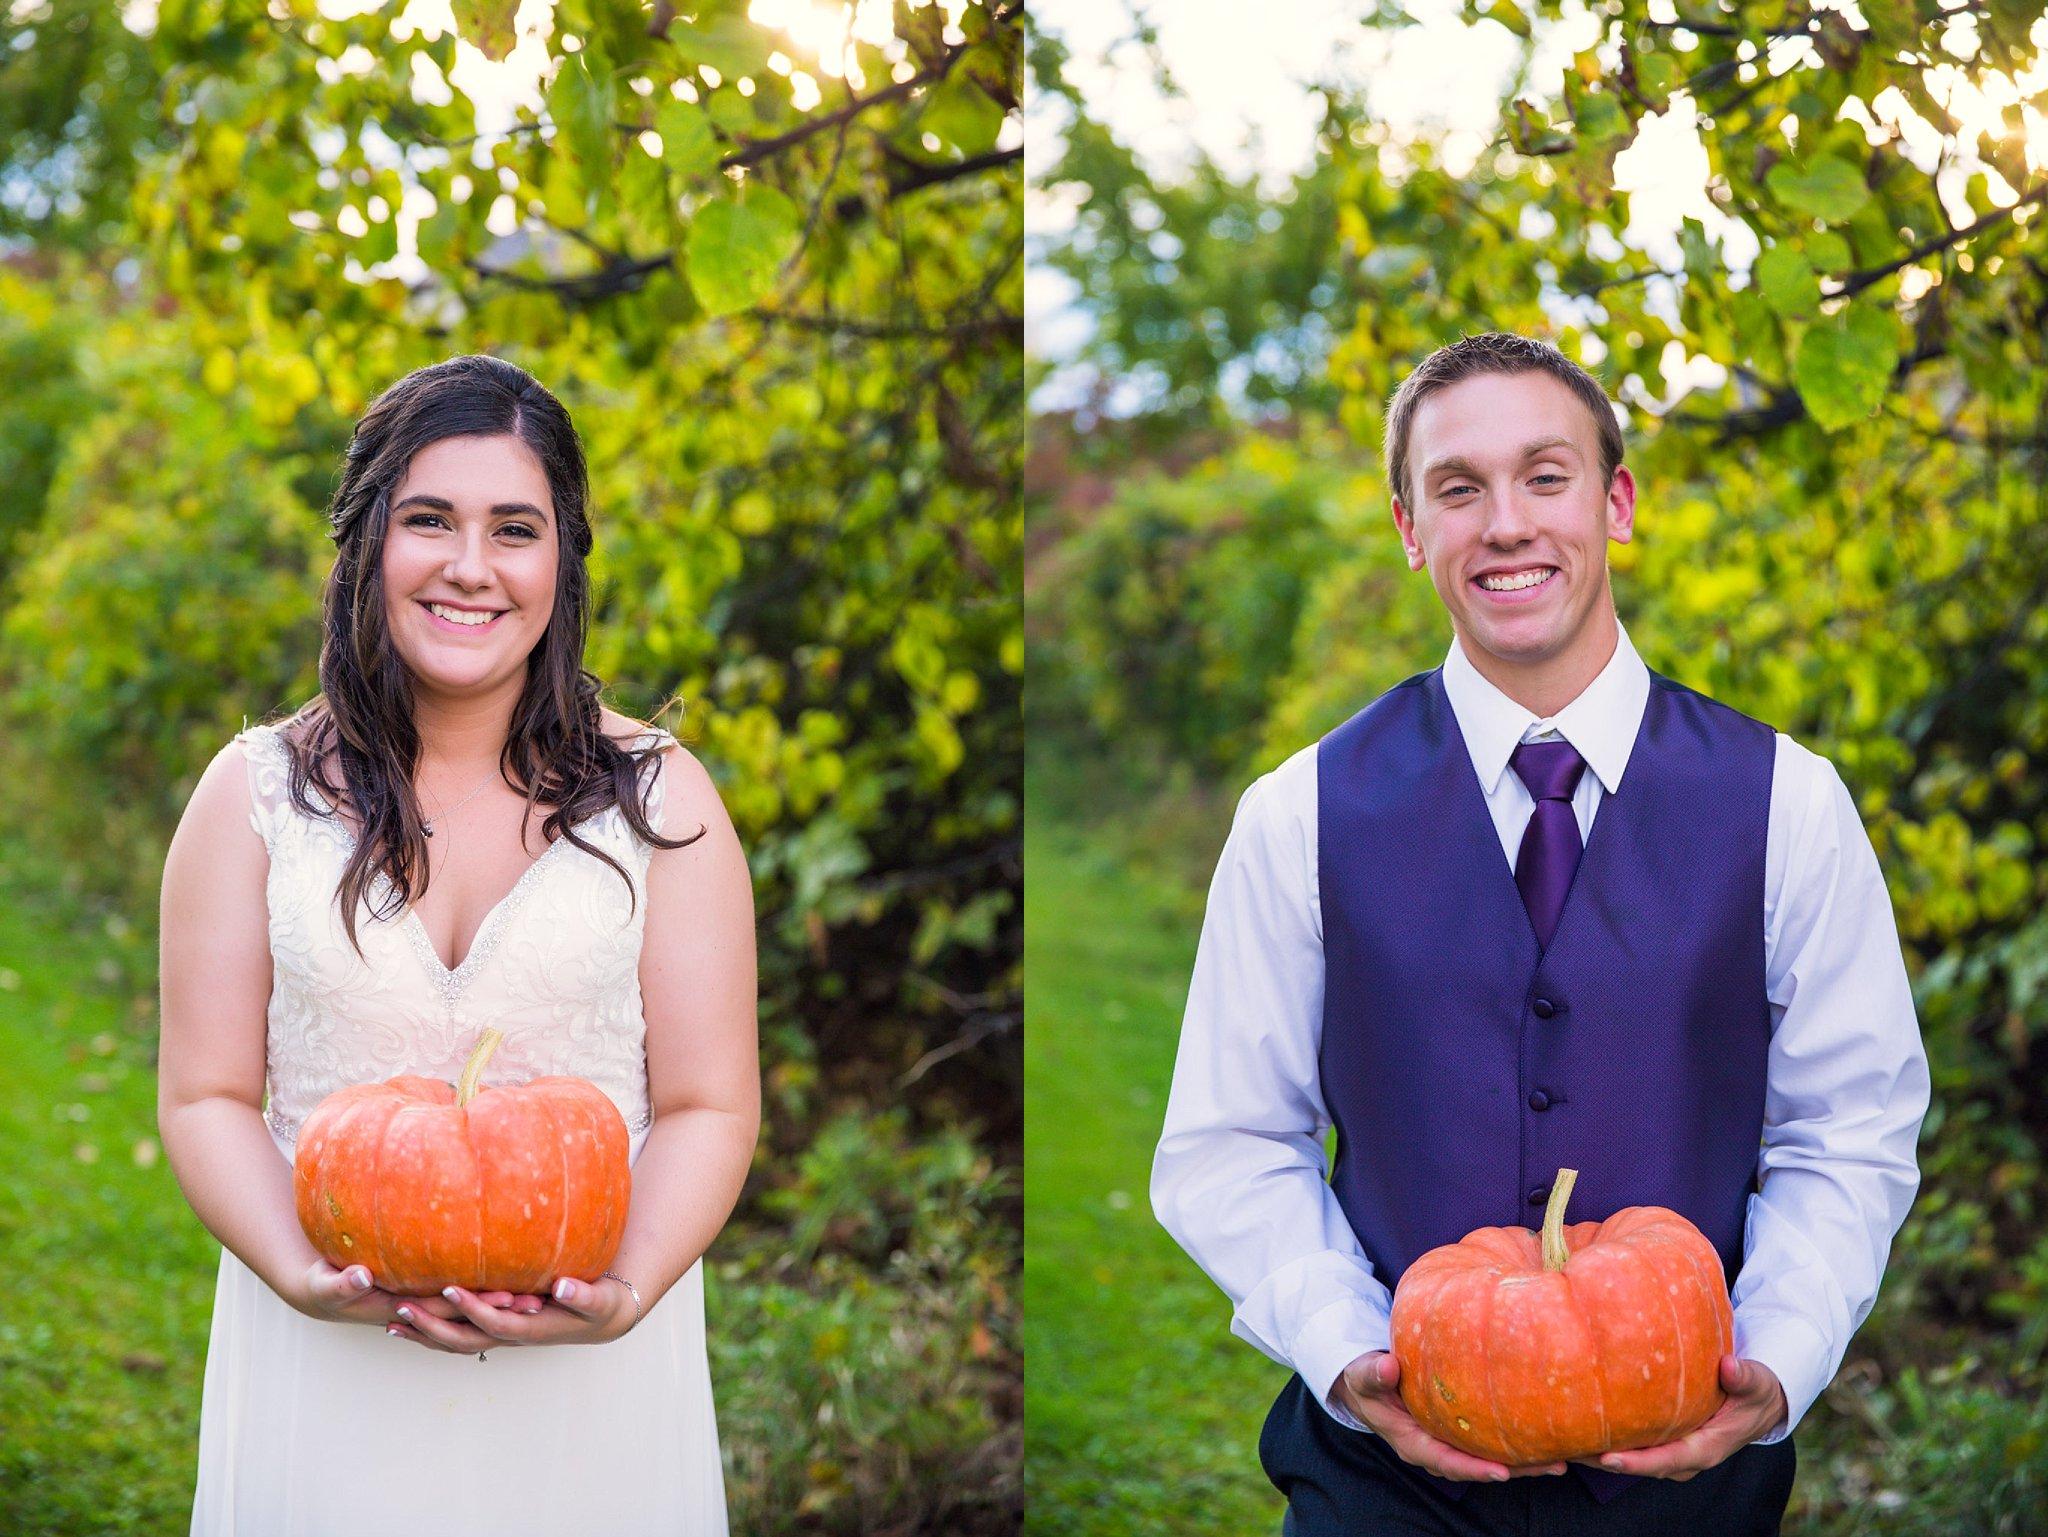 Wisconsin October Autumn wedding photography